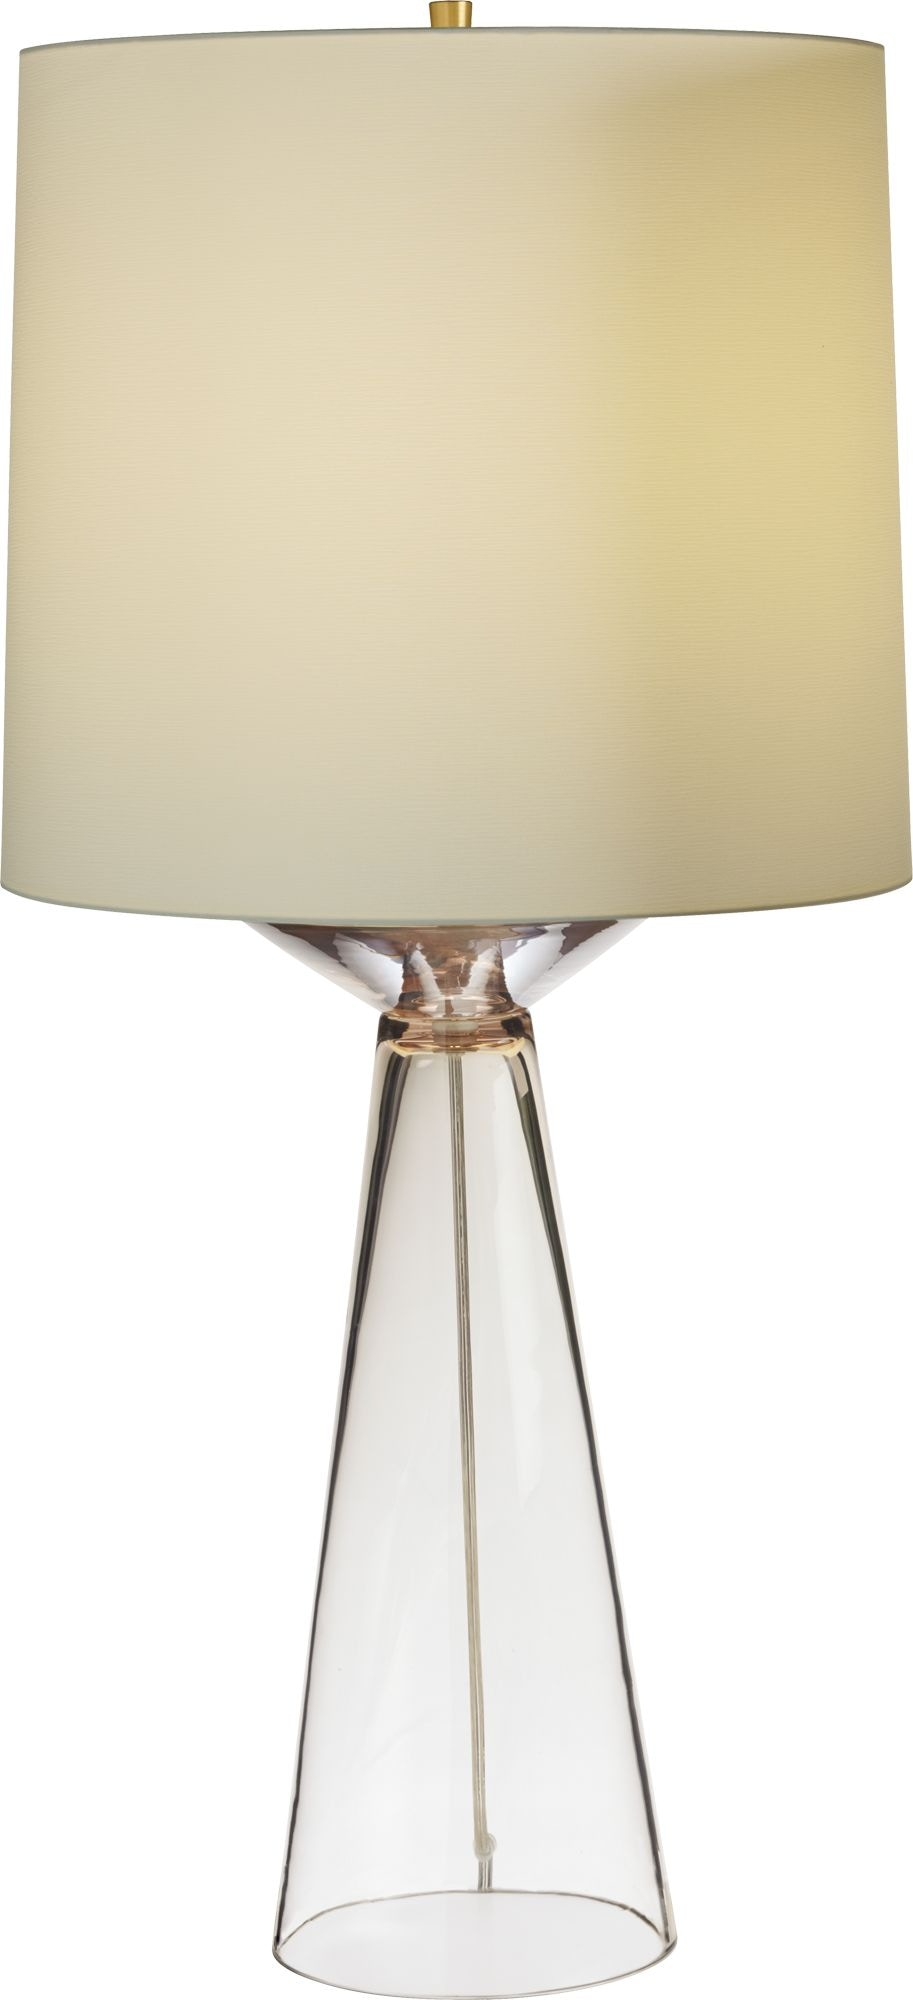 Baker Furniture Barbara Barry Waistline Table Lamp   Tall BB131